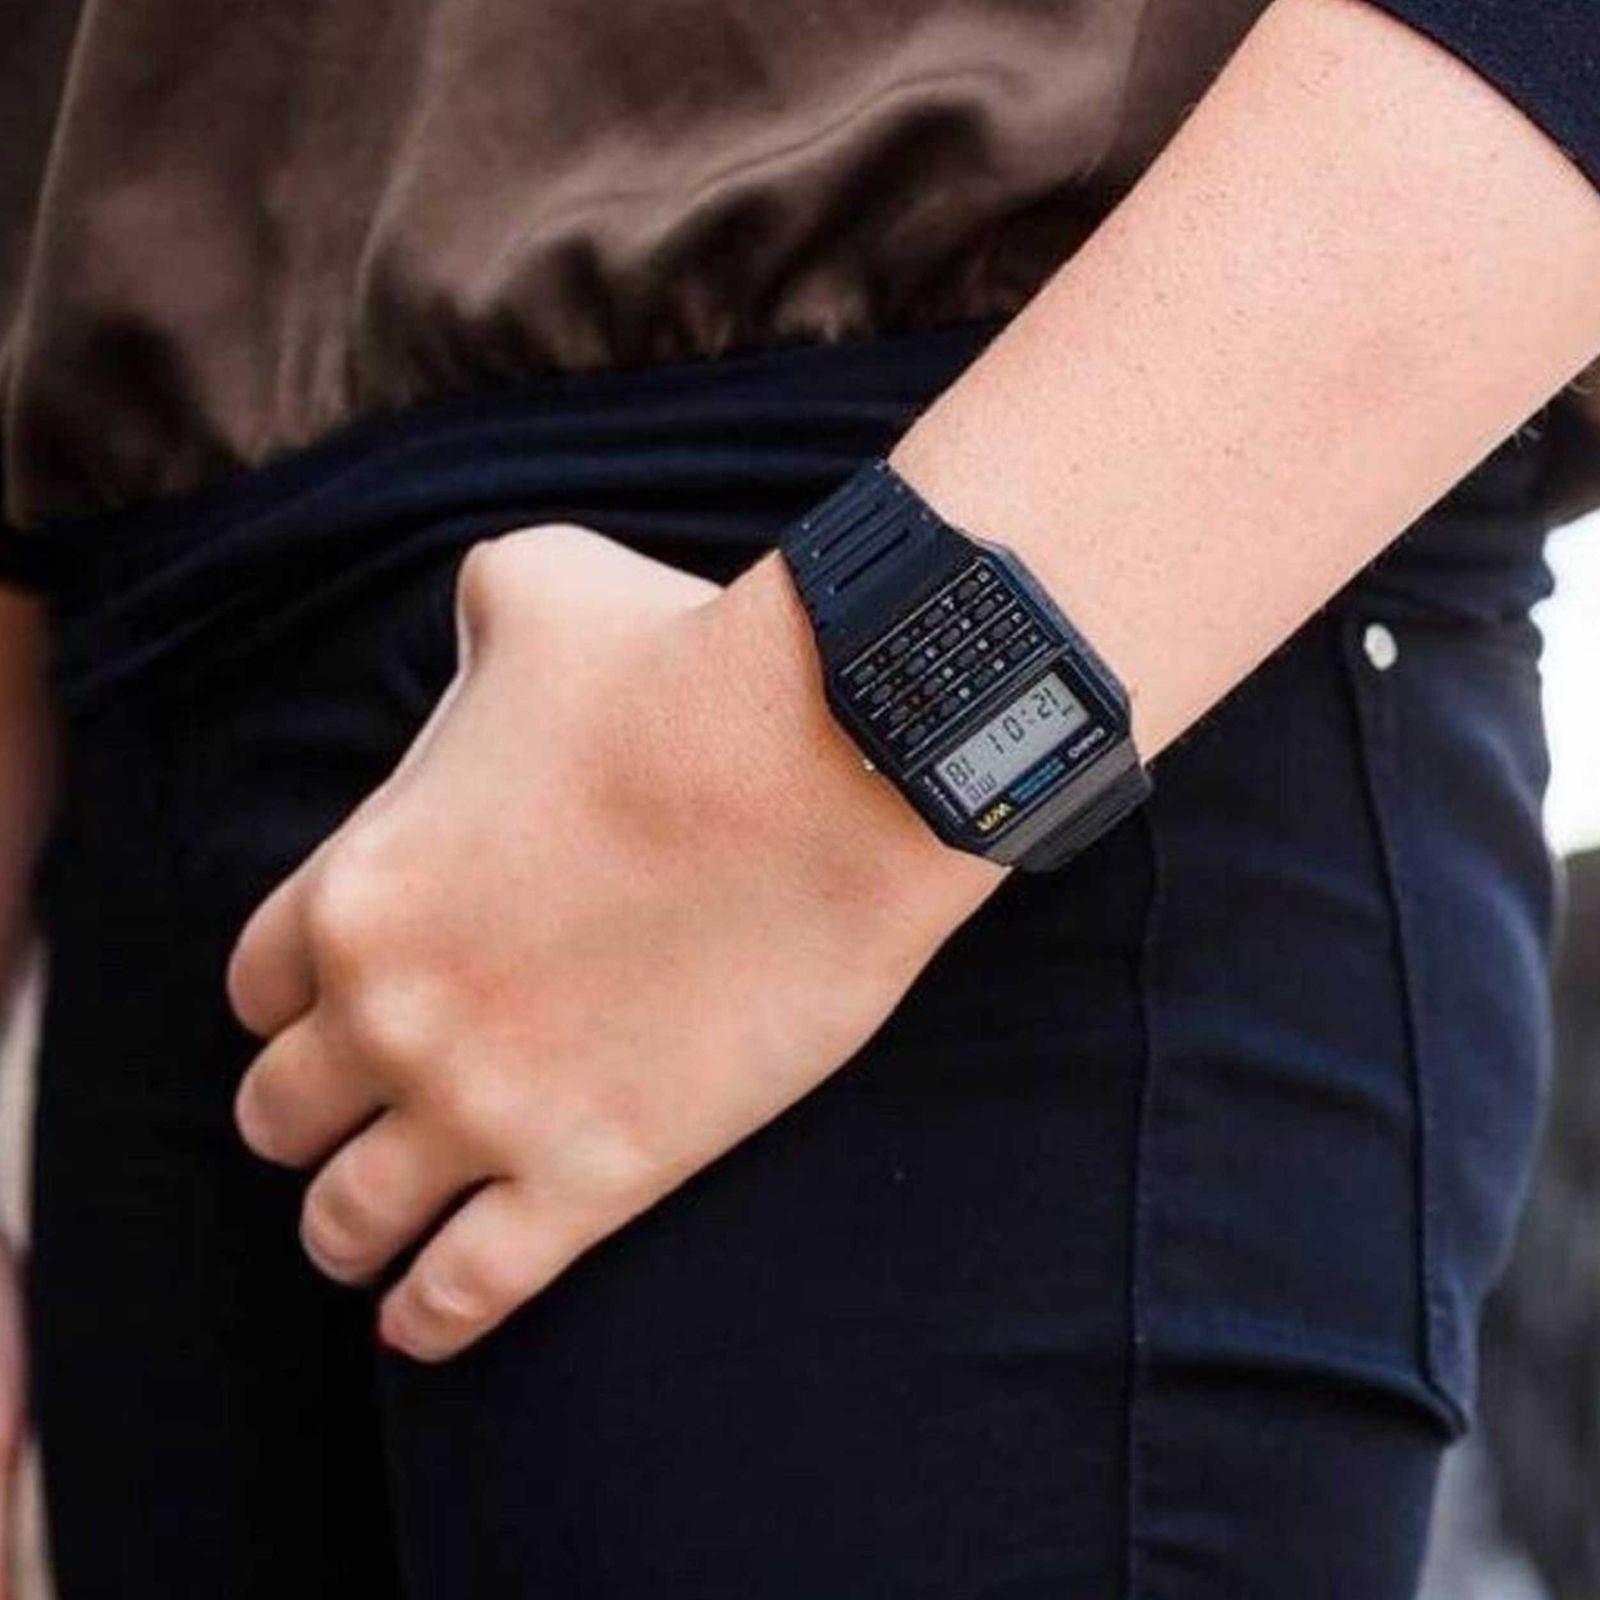 ساعت مچی دیجیتال کاسیو مدل 4971850223405 - مشکی - 3